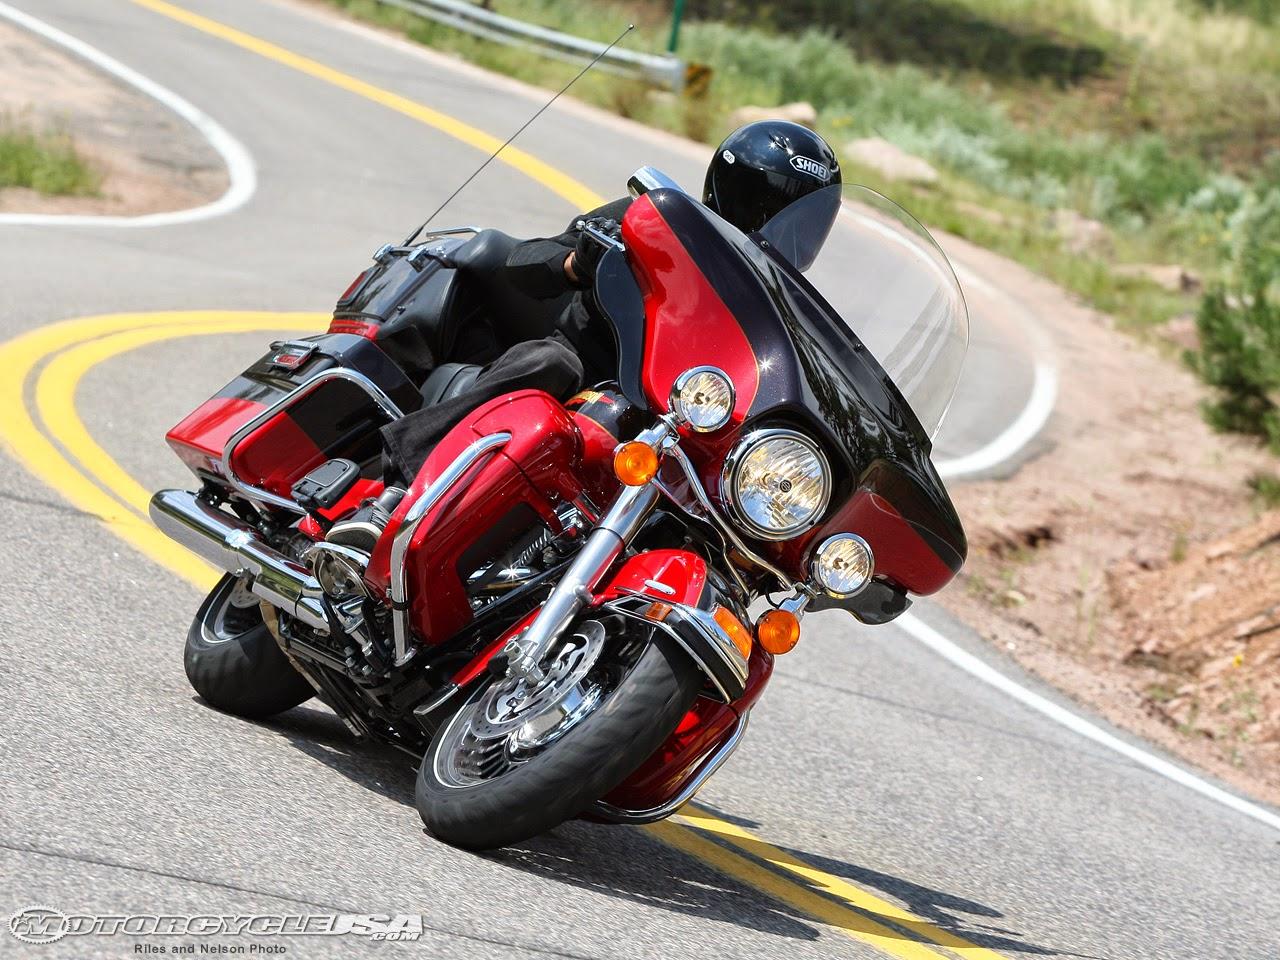 Download Harley-Davidson TOURING Owner's Manual 2010 for FLHT, FLHTC,  FLHTCU, FLHTK, FLHR, FLHRC, FLTRX, FLHX Content: Owner's Manual File type:  PDF